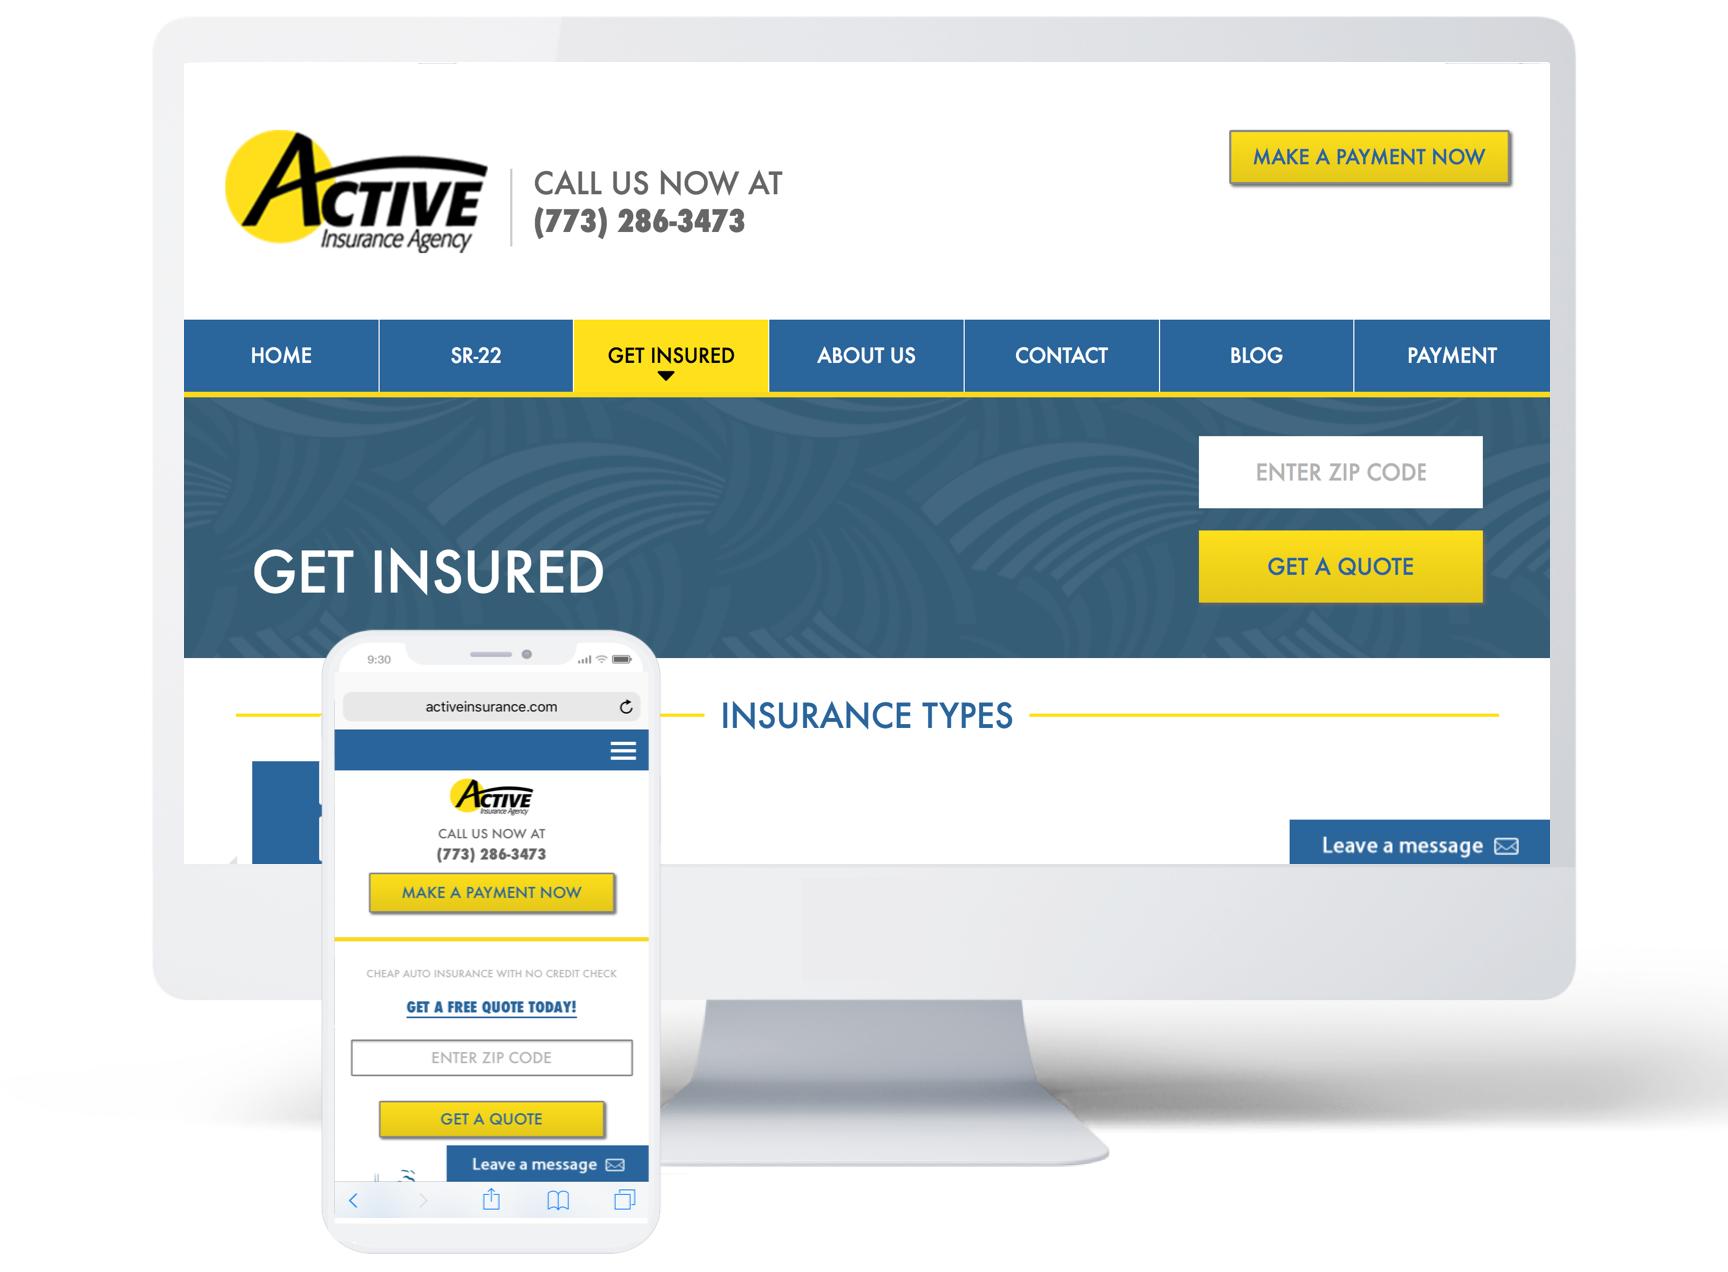 iMac_ActiveInsurance